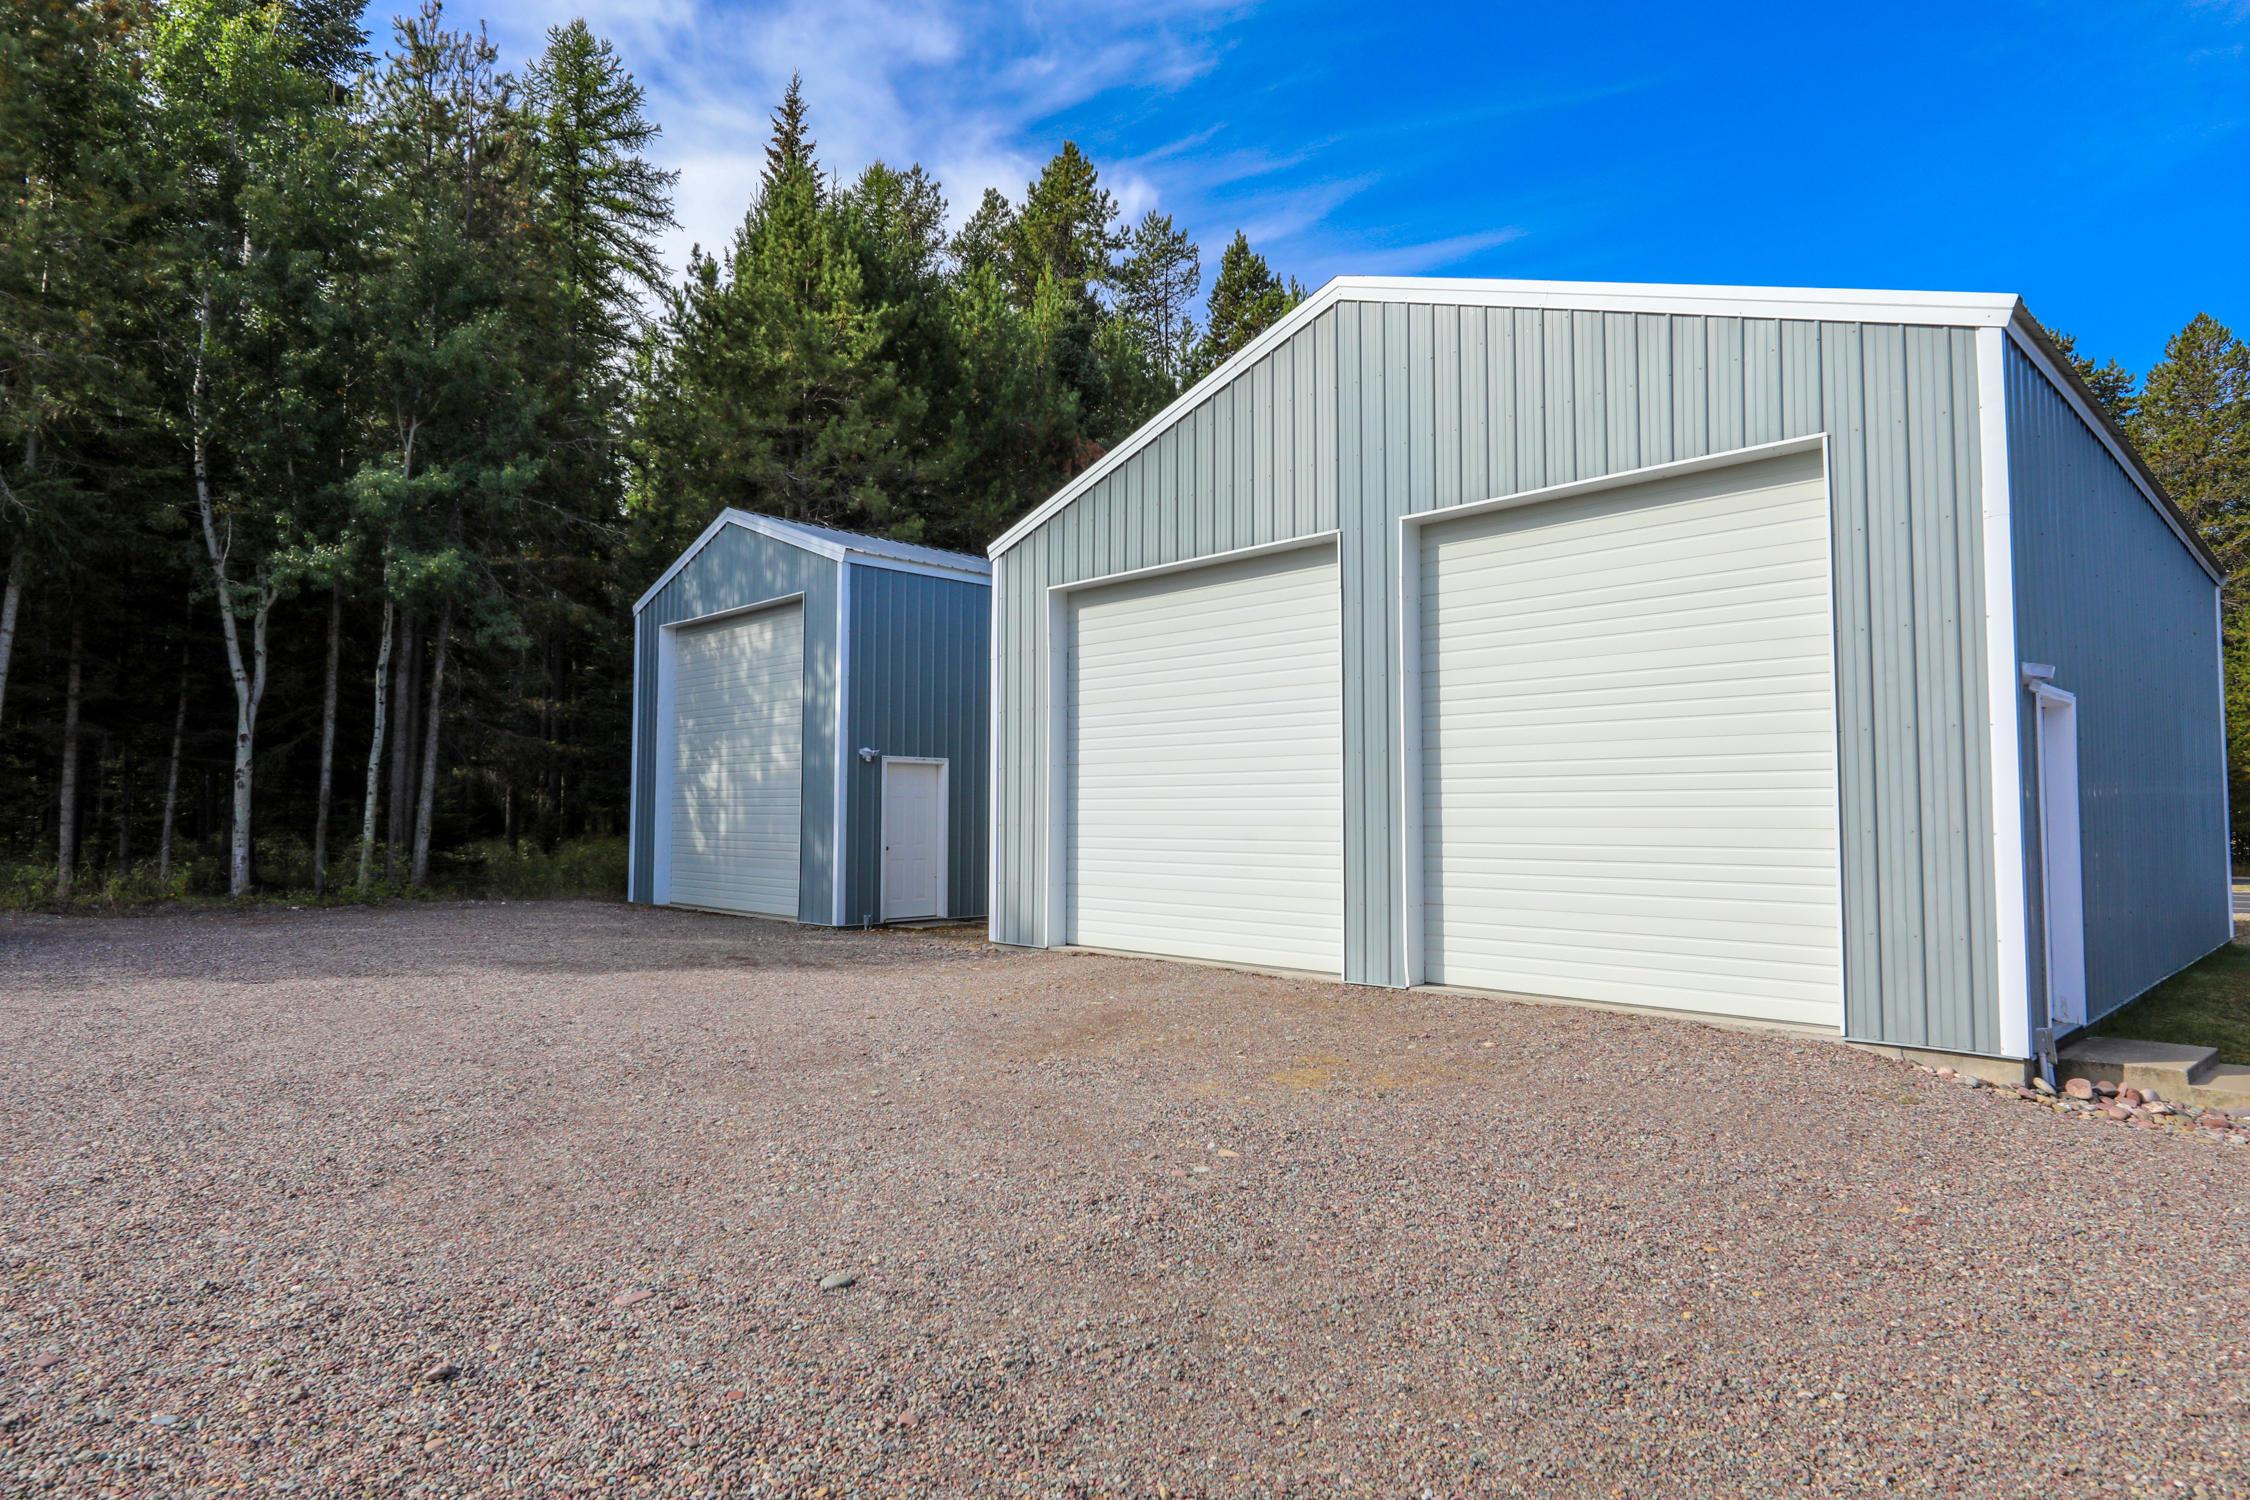 Two shops/RV storage